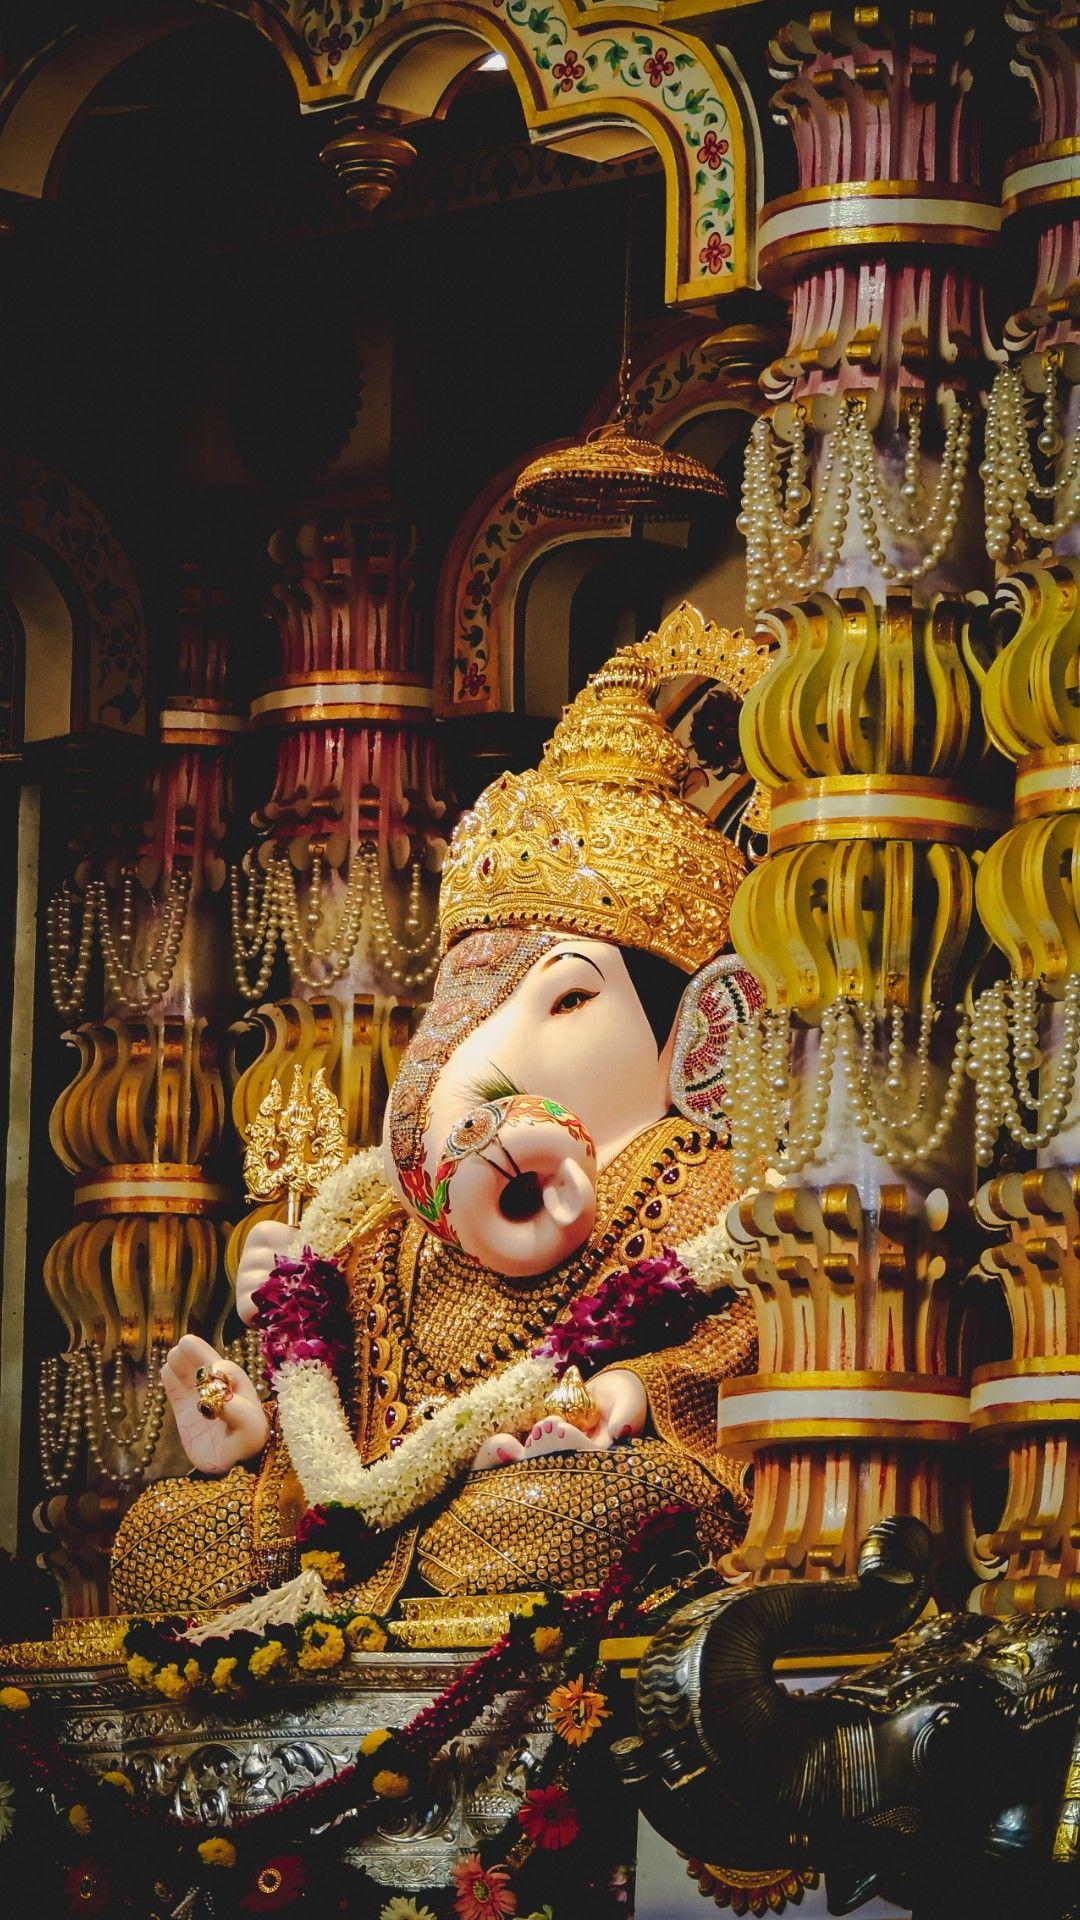 Get Over 20 Hd Ganesha Wallpapers In 2020 Ganpati Bappa Wallpapers Happy Ganesh Chaturthi Images Ganesh Wallpaper Ganpati bappa images hd wallpaper